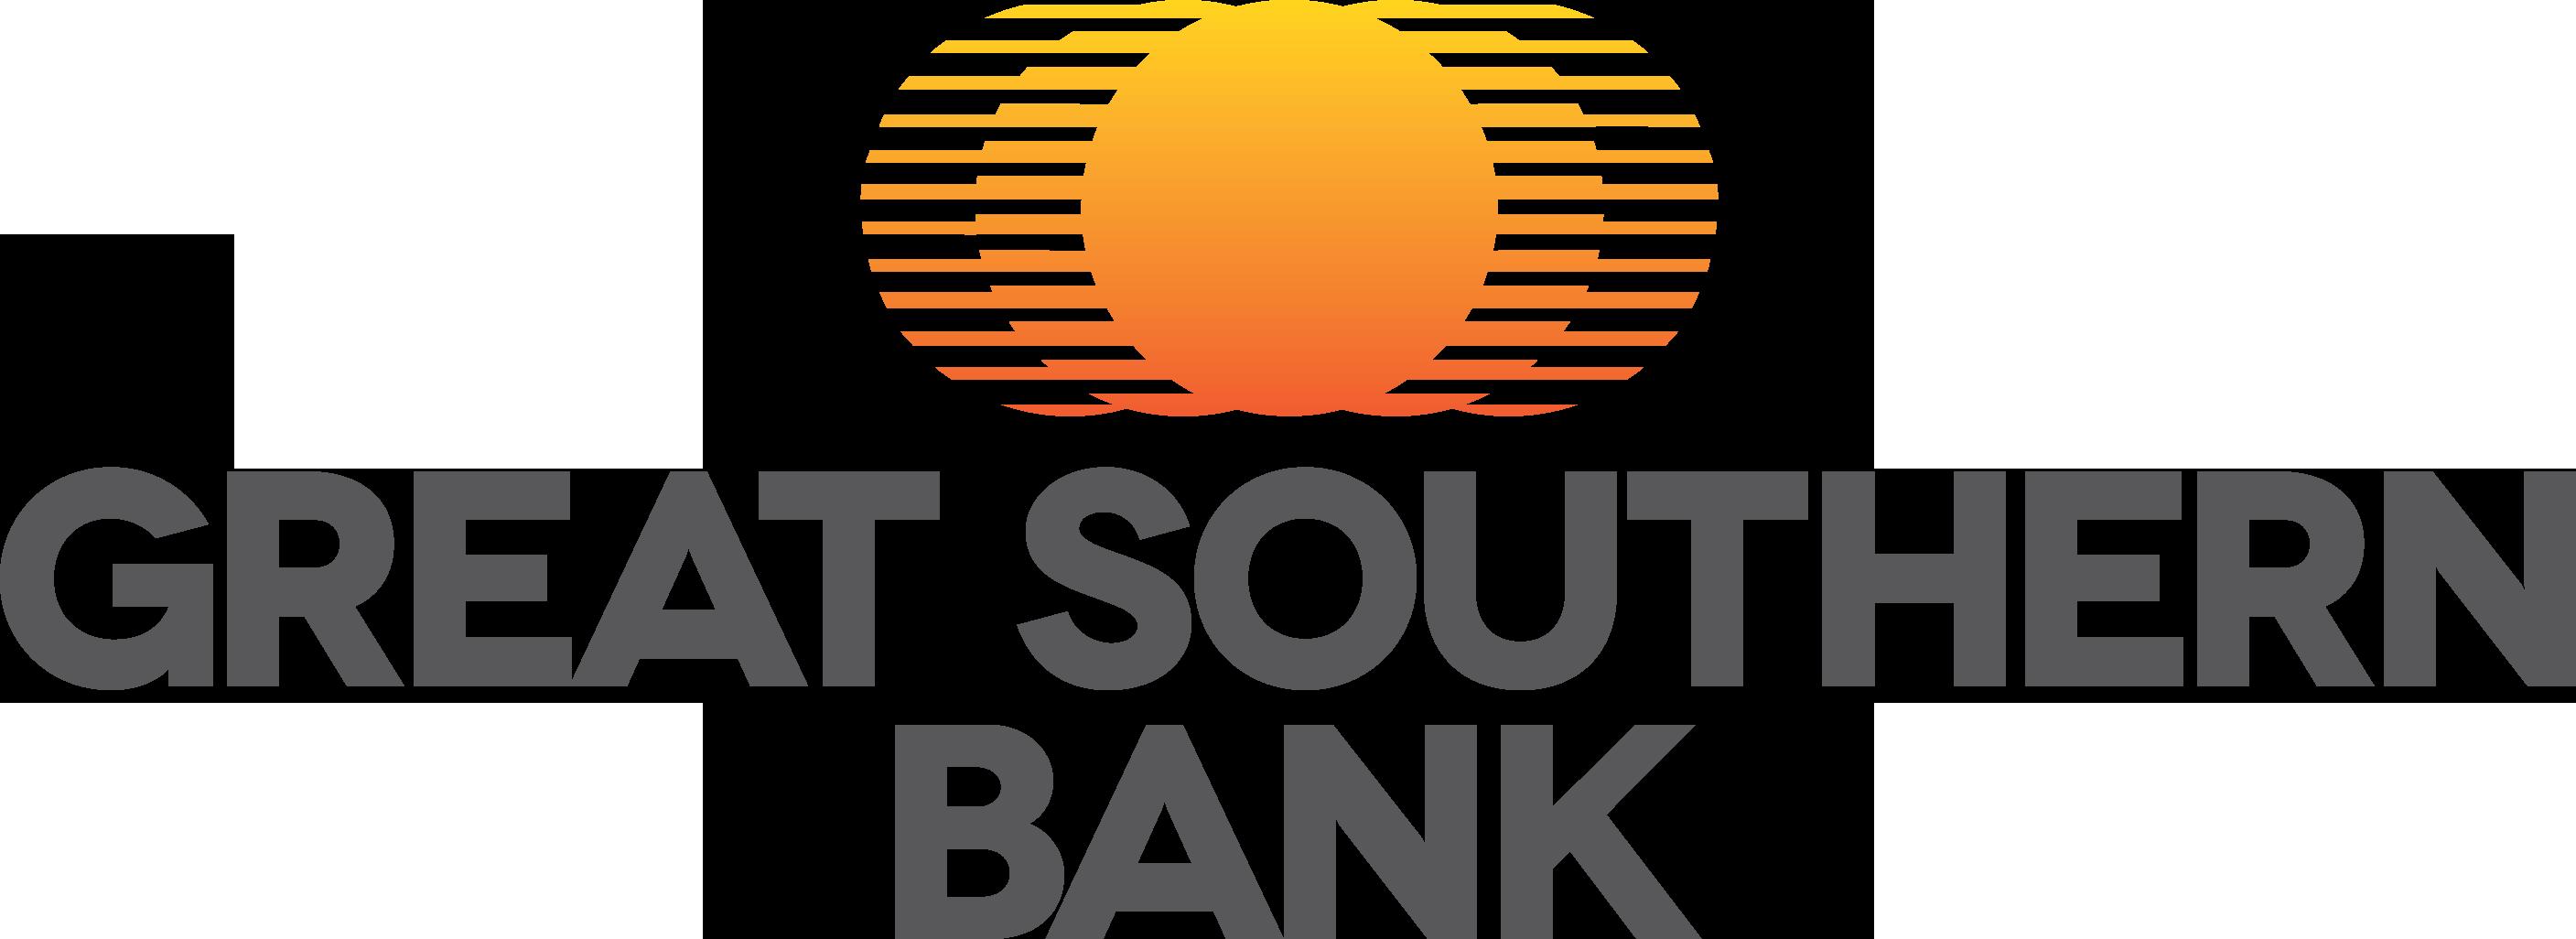 https://growthzonesitesprod.azureedge.net/wp-content/uploads/sites/969/2021/08/Great-Southern-Bank.png